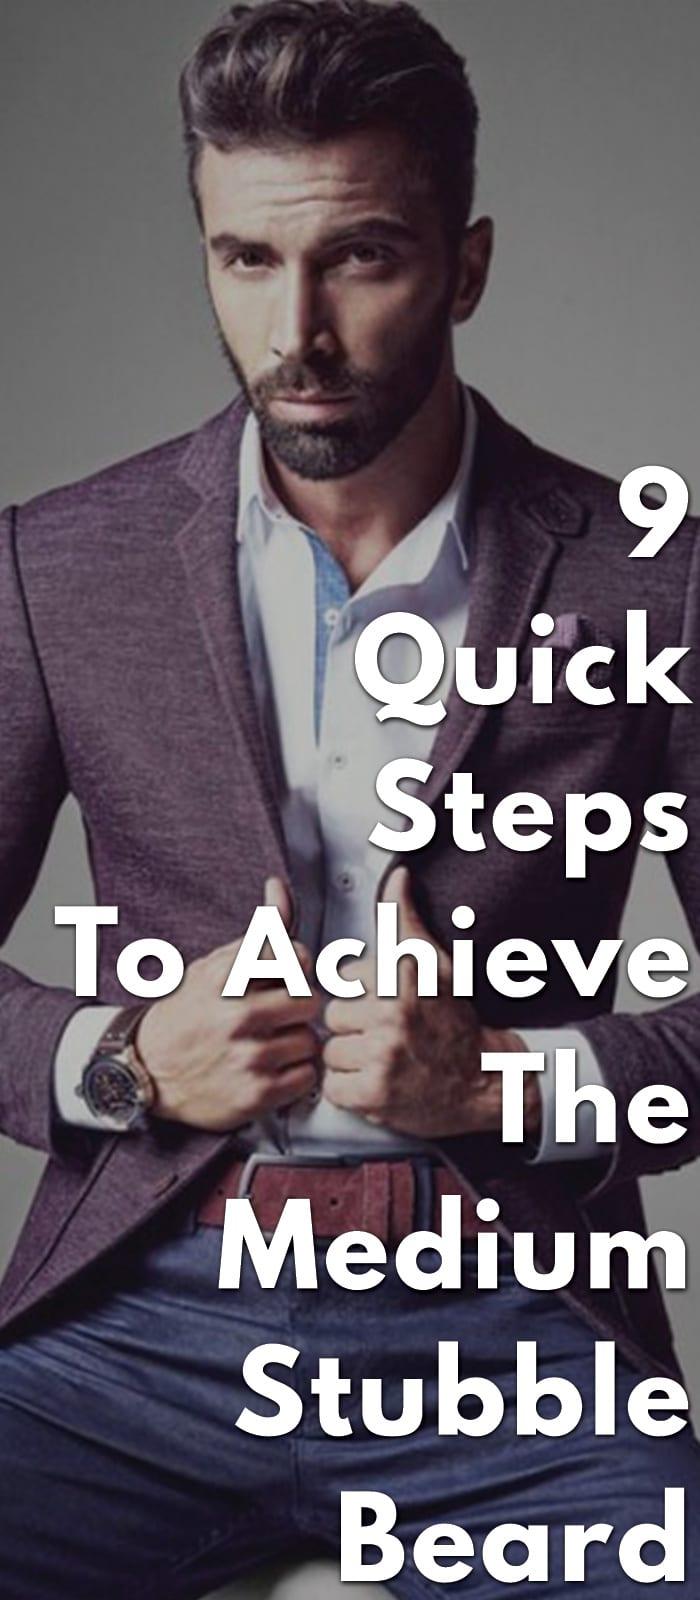 9-Quick-Steps-To-Achieve-The-Medium-Stubble-Beard.